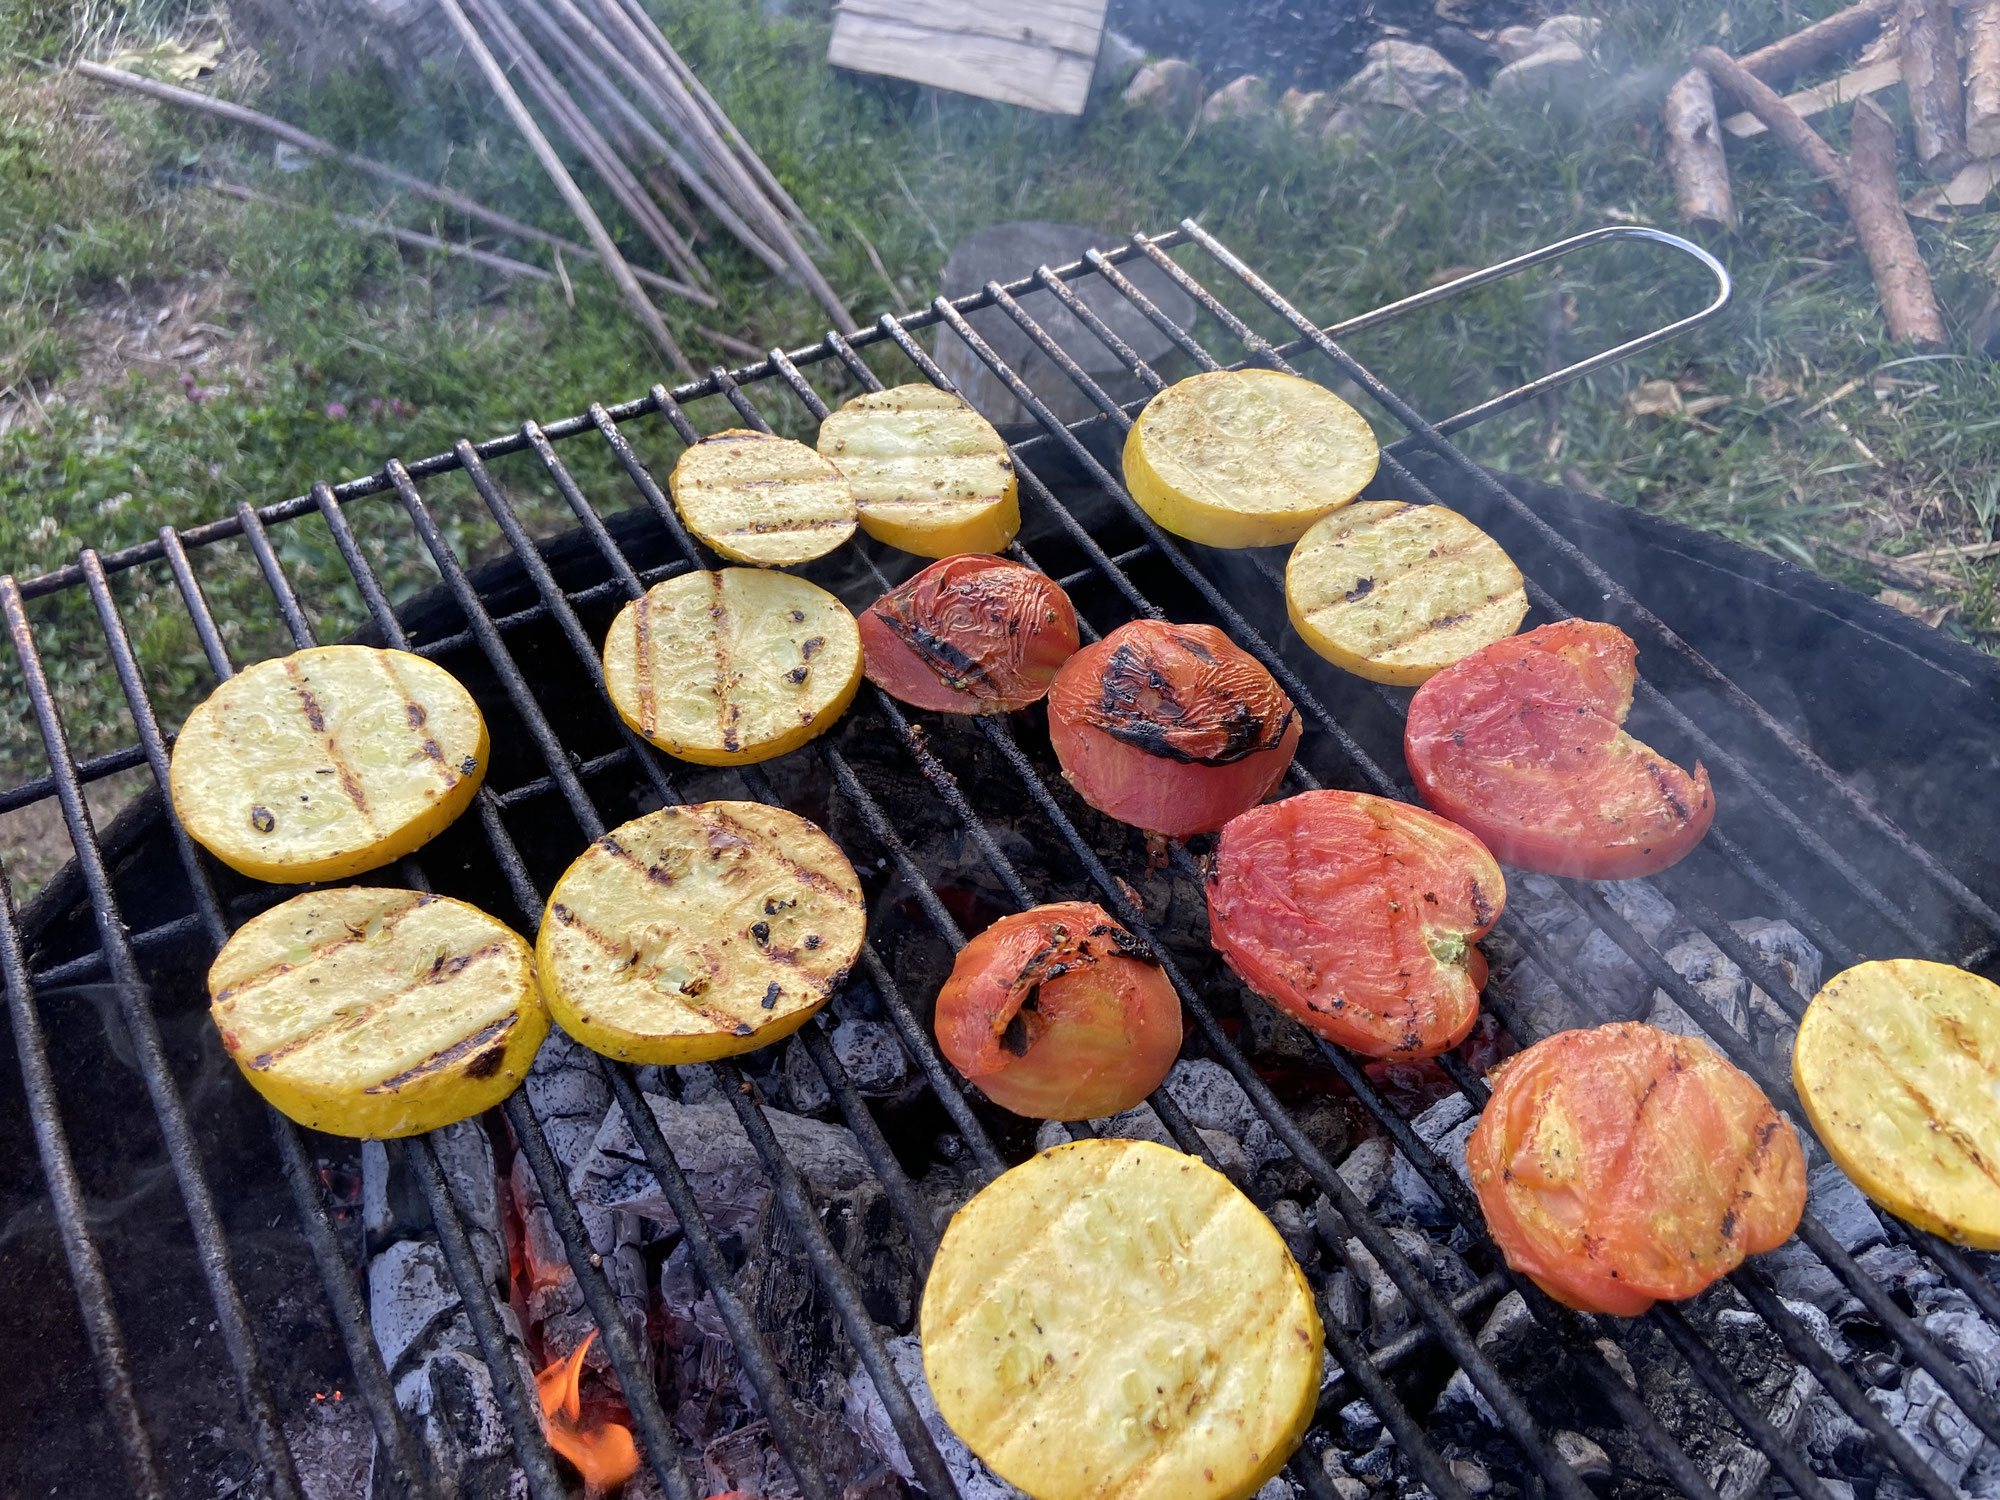 Rote Rübe, Paradeiser, Zucchini vom Grill